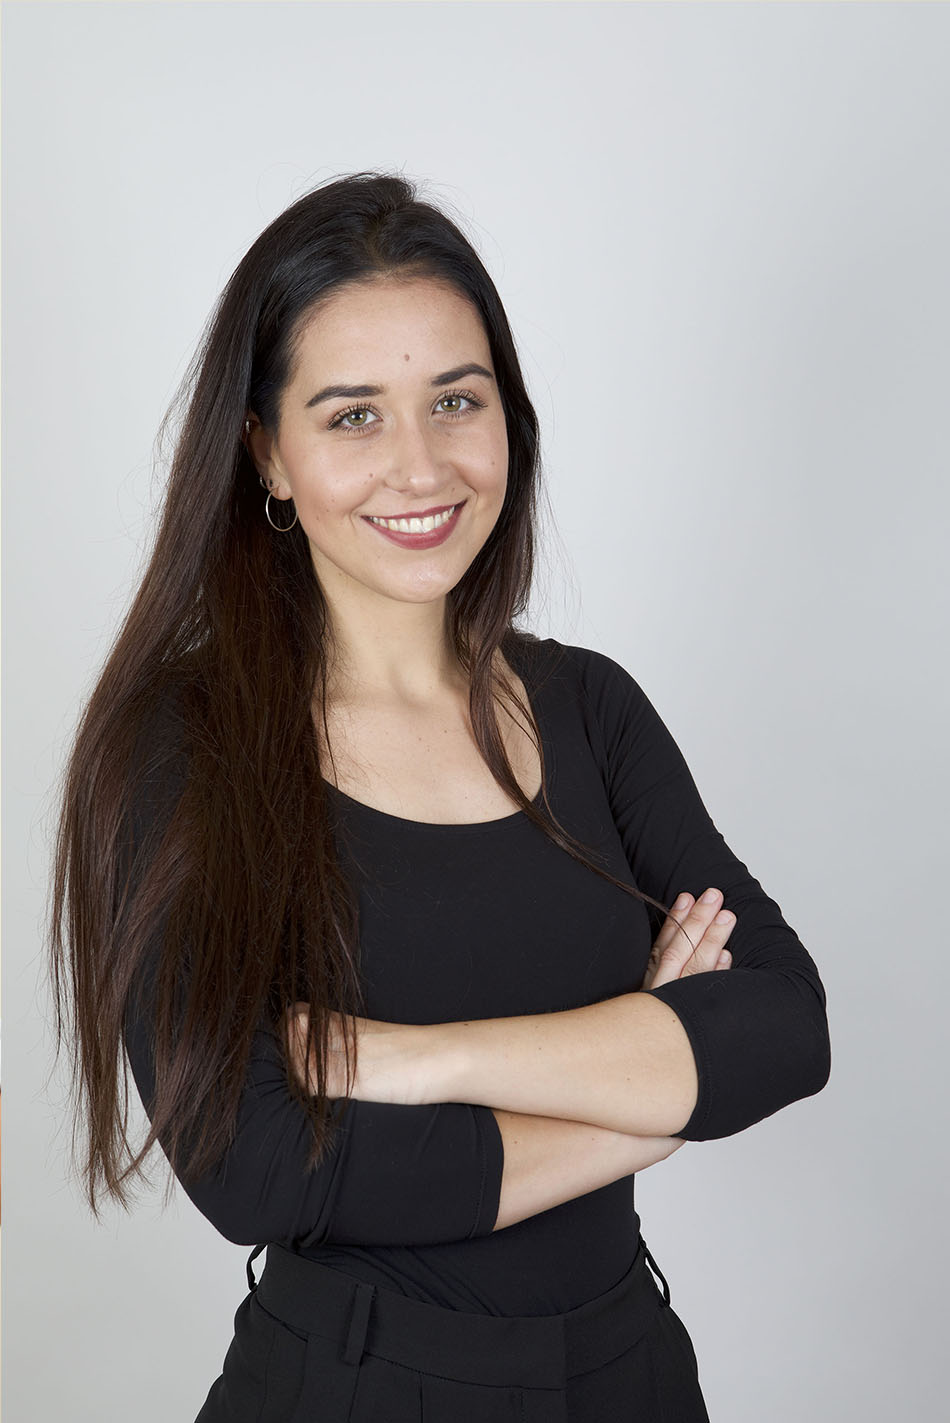 SOFIA BLANCO FERNANDEZ